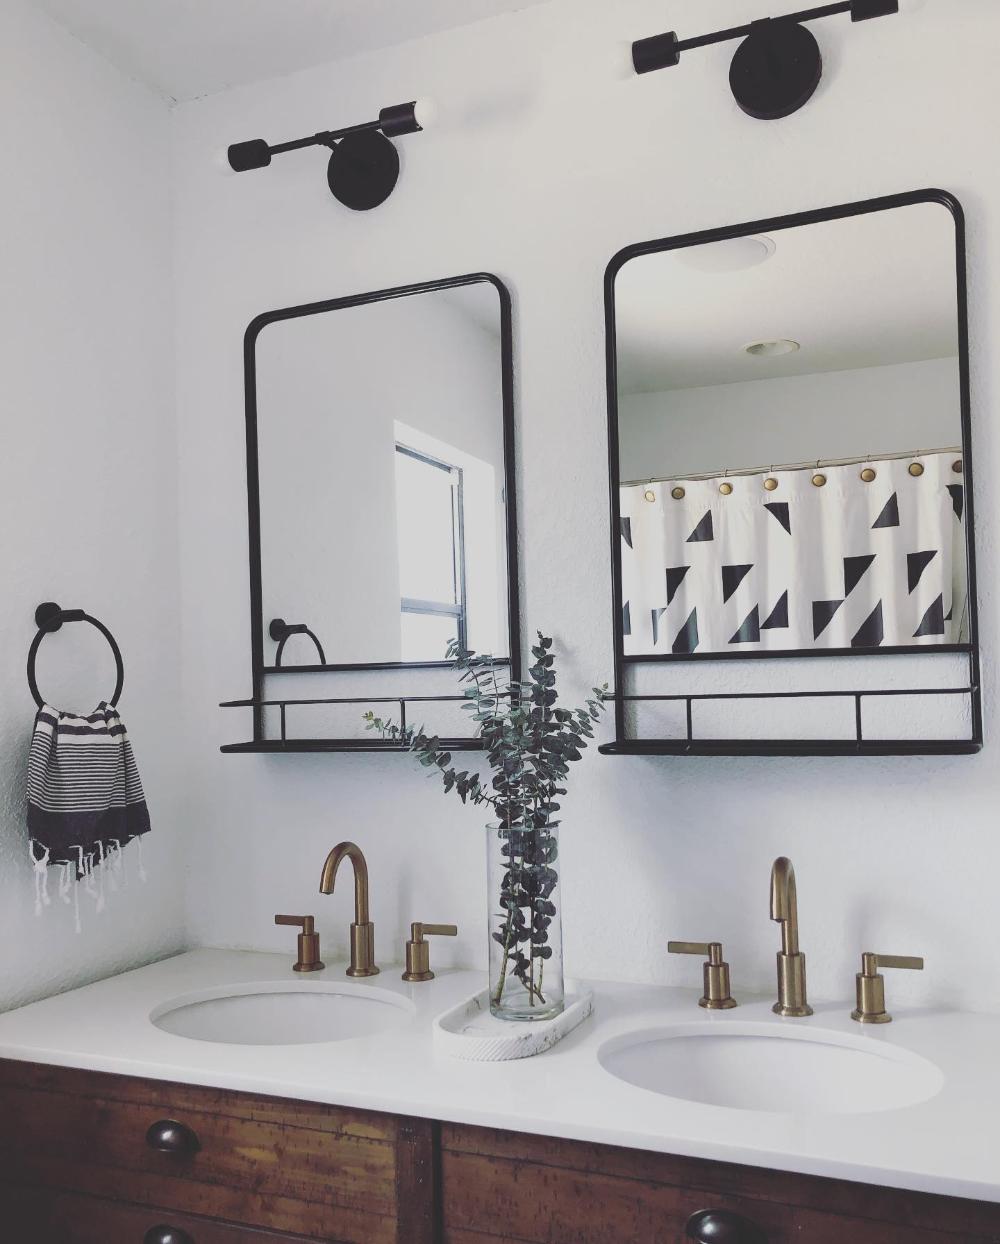 20 X 30 Pharmacy Mirror With Metal Shelf Powder Coated Mirror Pewter Threshold Farmhouse Bathroom Mirrors Black Bathroom Mirrors Bathroom Mirror With Shelf